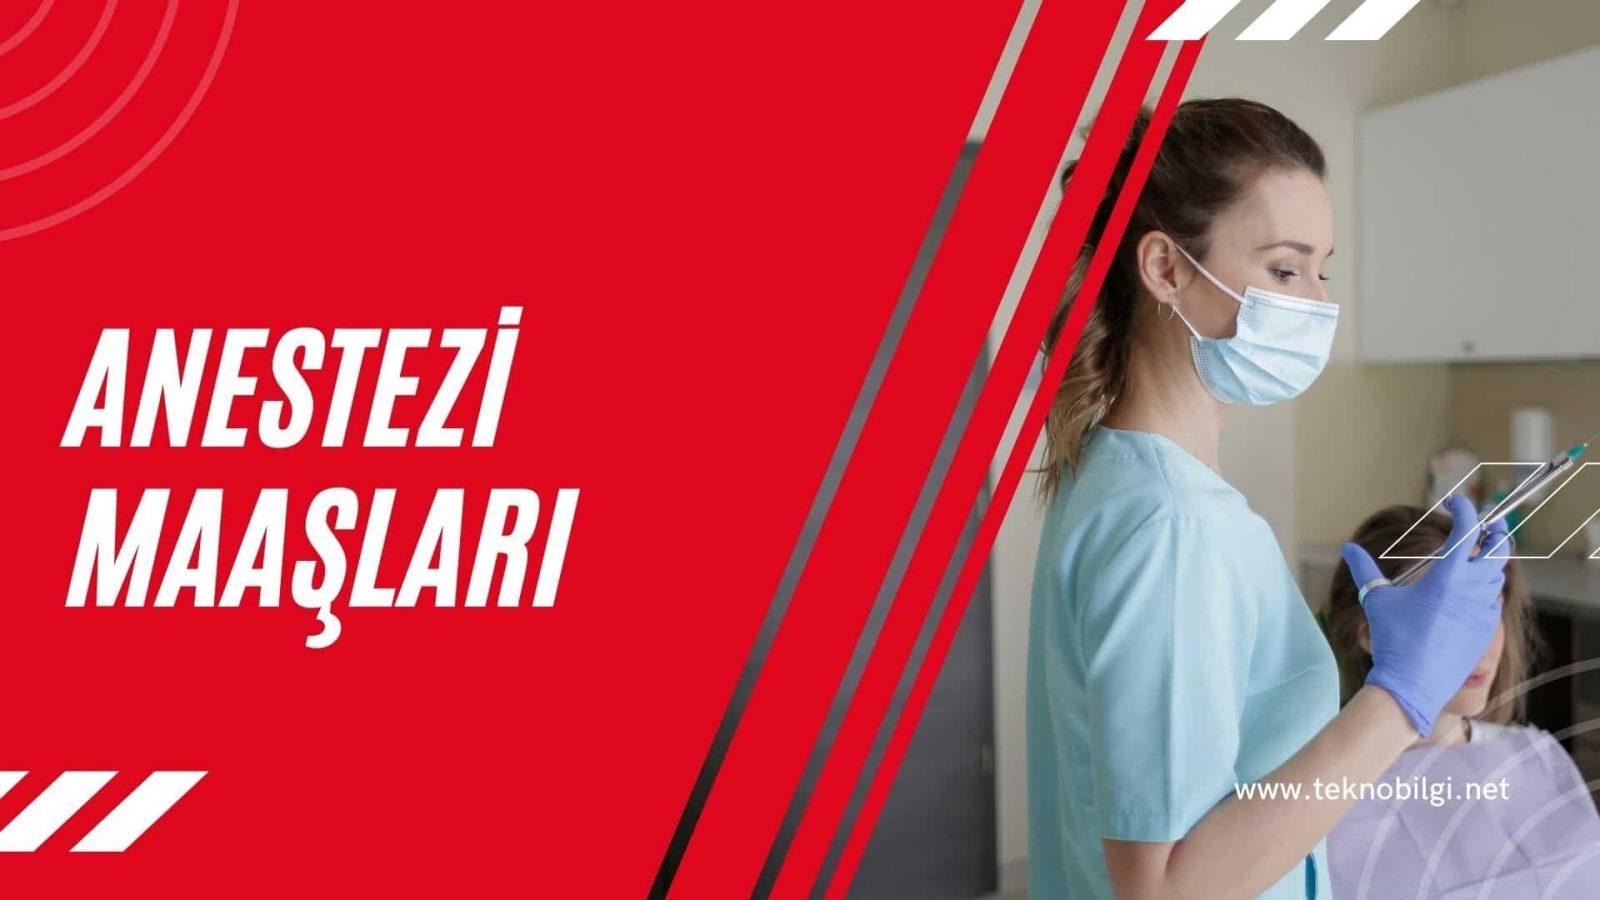 Anestezi Maaşları, Anestezi Maaşları 2021